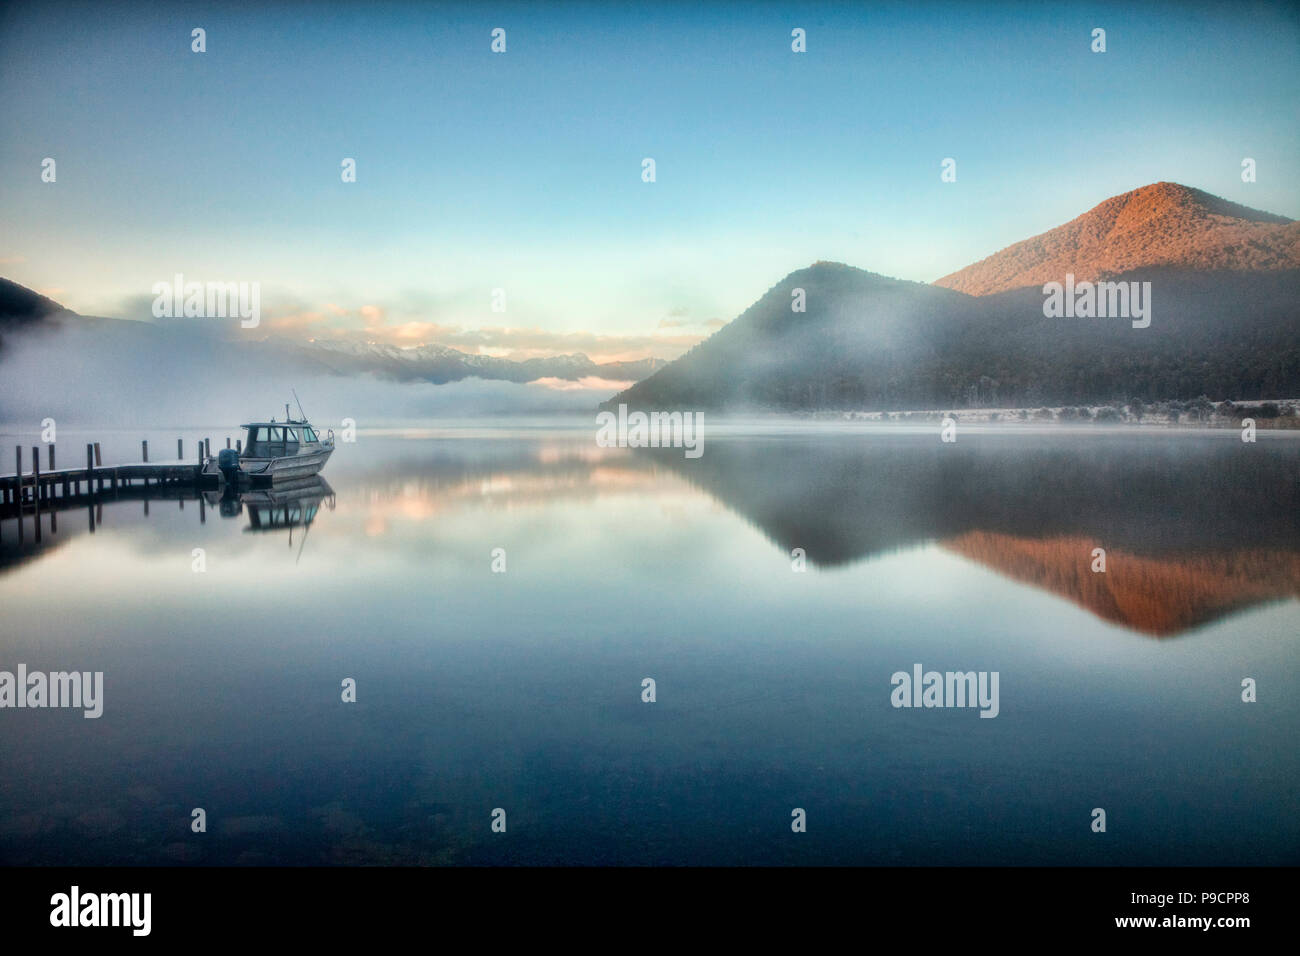 Eine colde und nebliger Morgen am Lake Rotoroa, Nelson Lakes National Park, Neuseeland. Stockfoto